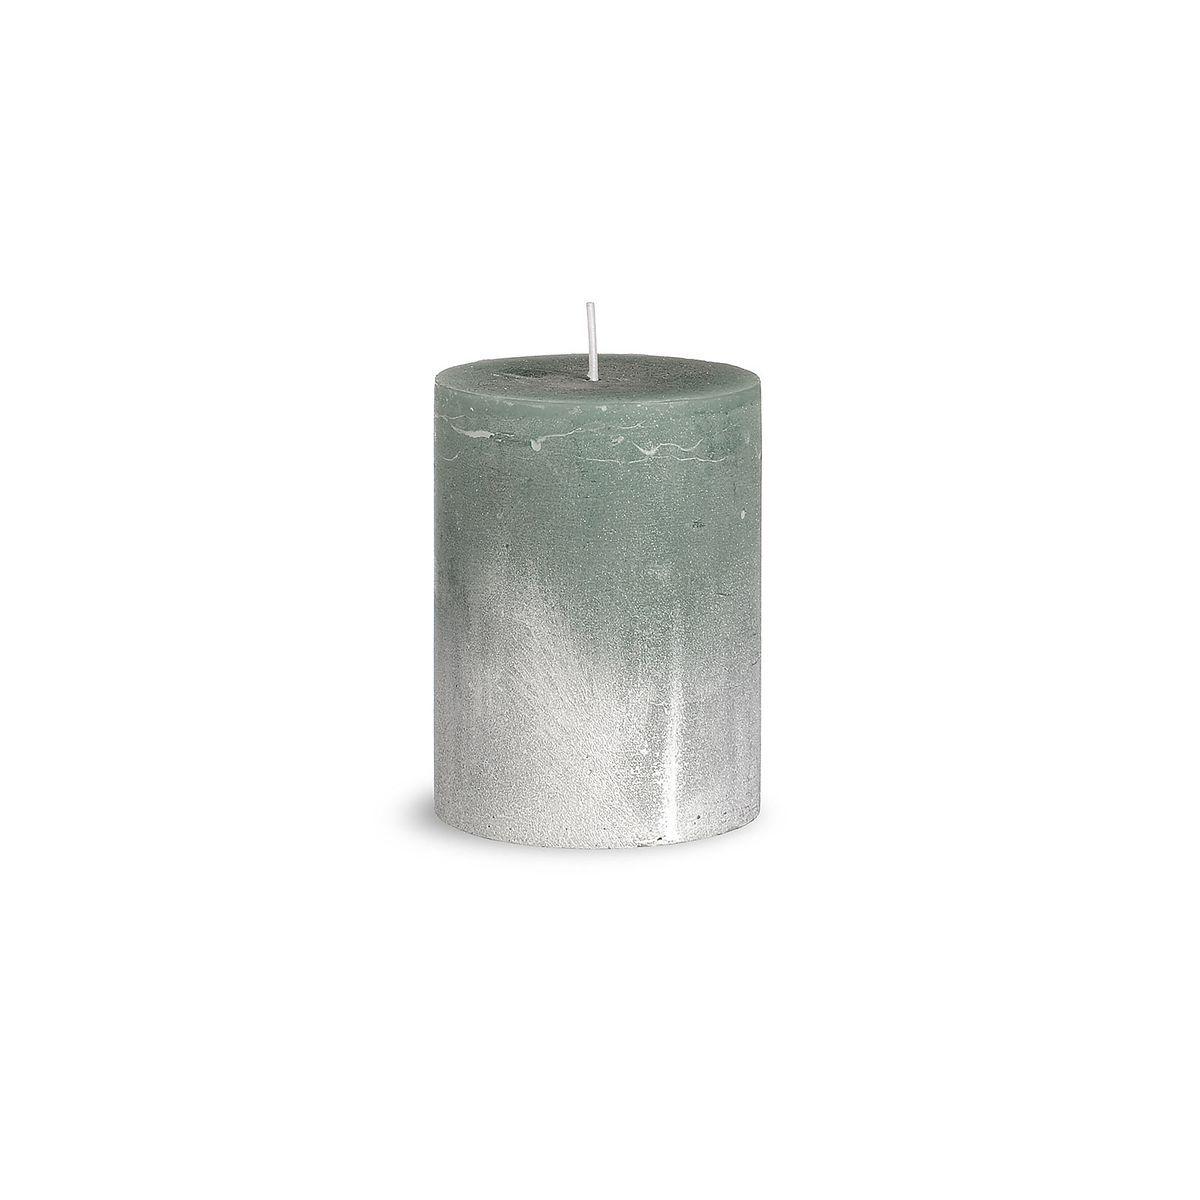 Kerze Rustic D 7 5cm X H 10cm Mintgrun Silberspray Adventskranz